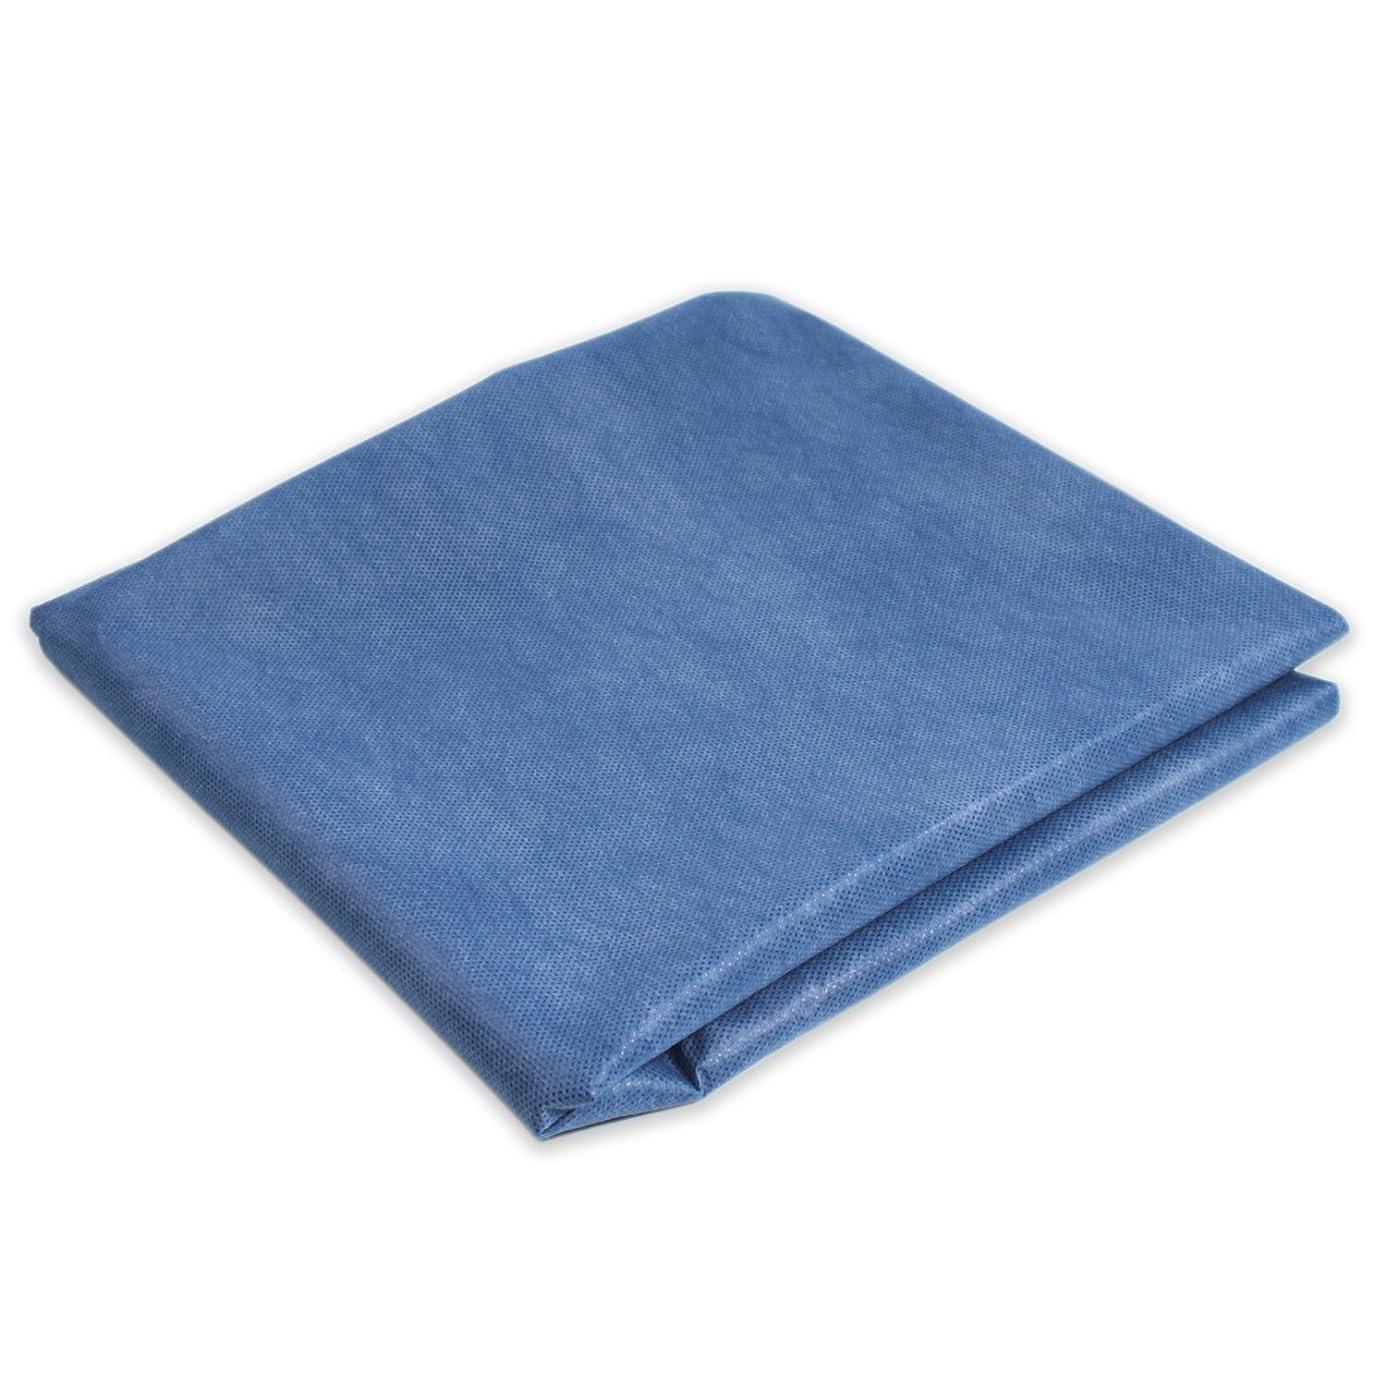 Dynarex Premium Flat Cot Sheet 40 x 85 Dark Blue 50/cs